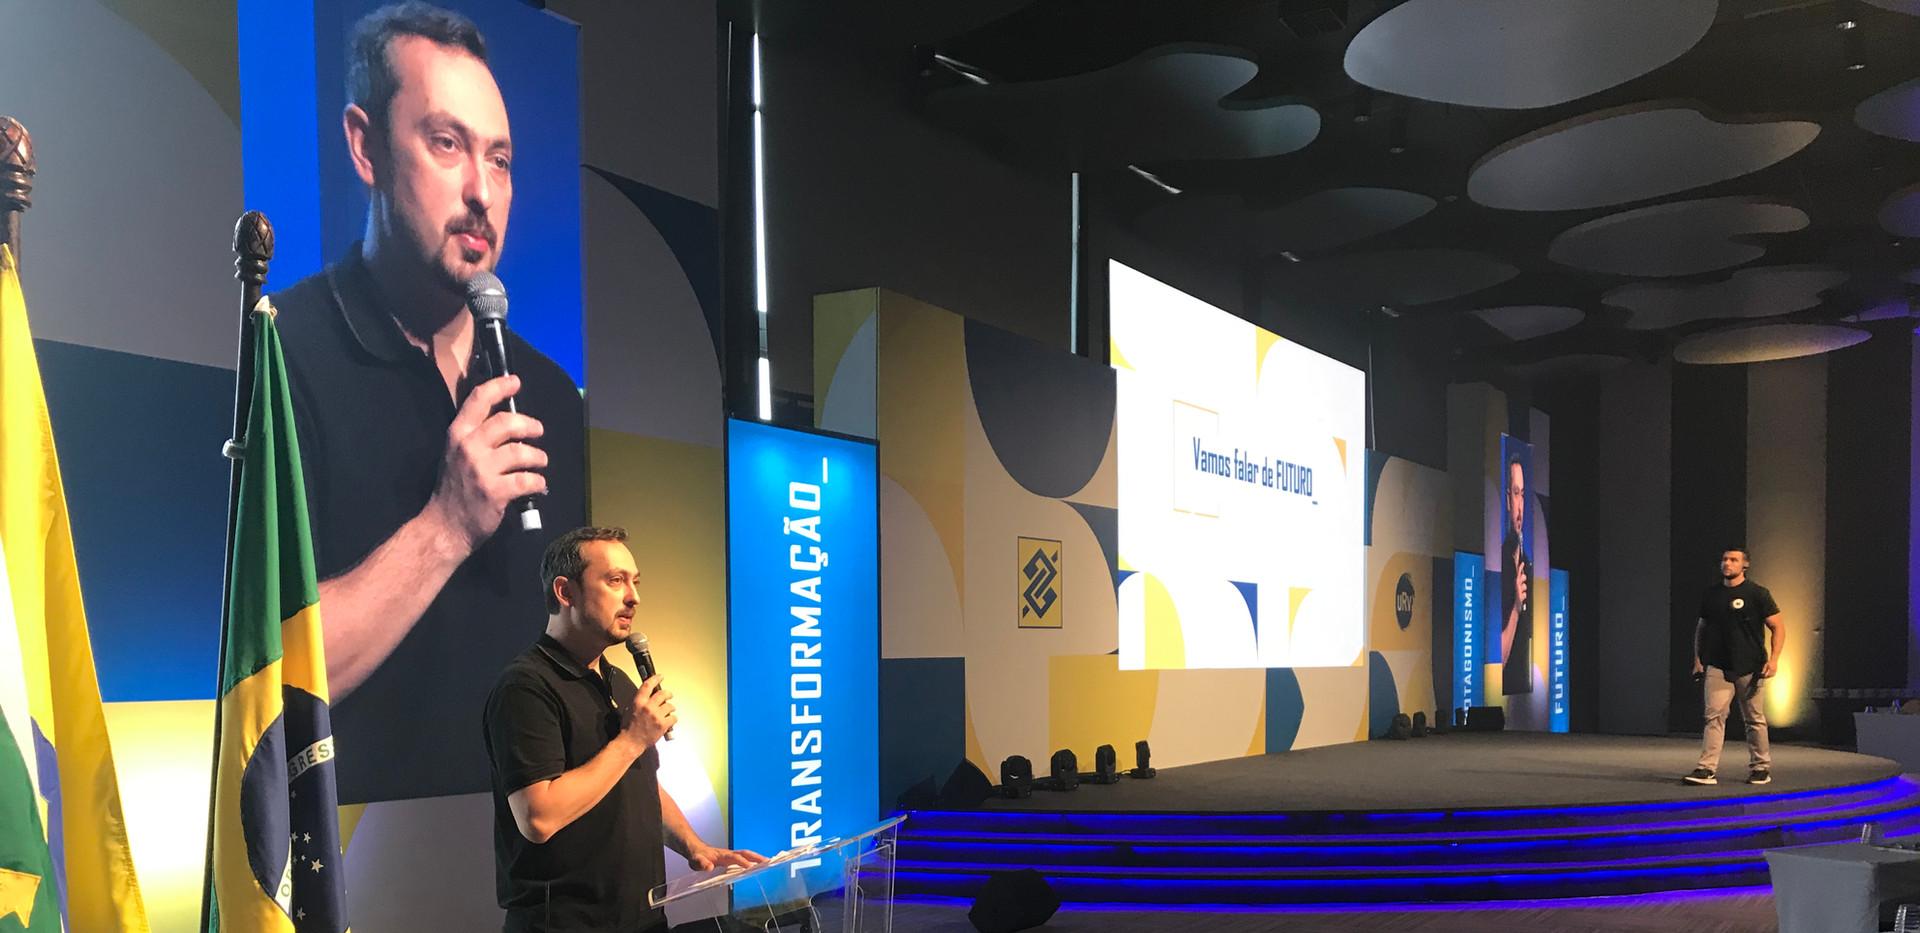 ENLID Banco do Brasil - Brasilia - Diretor Artístico Fernando Ordones